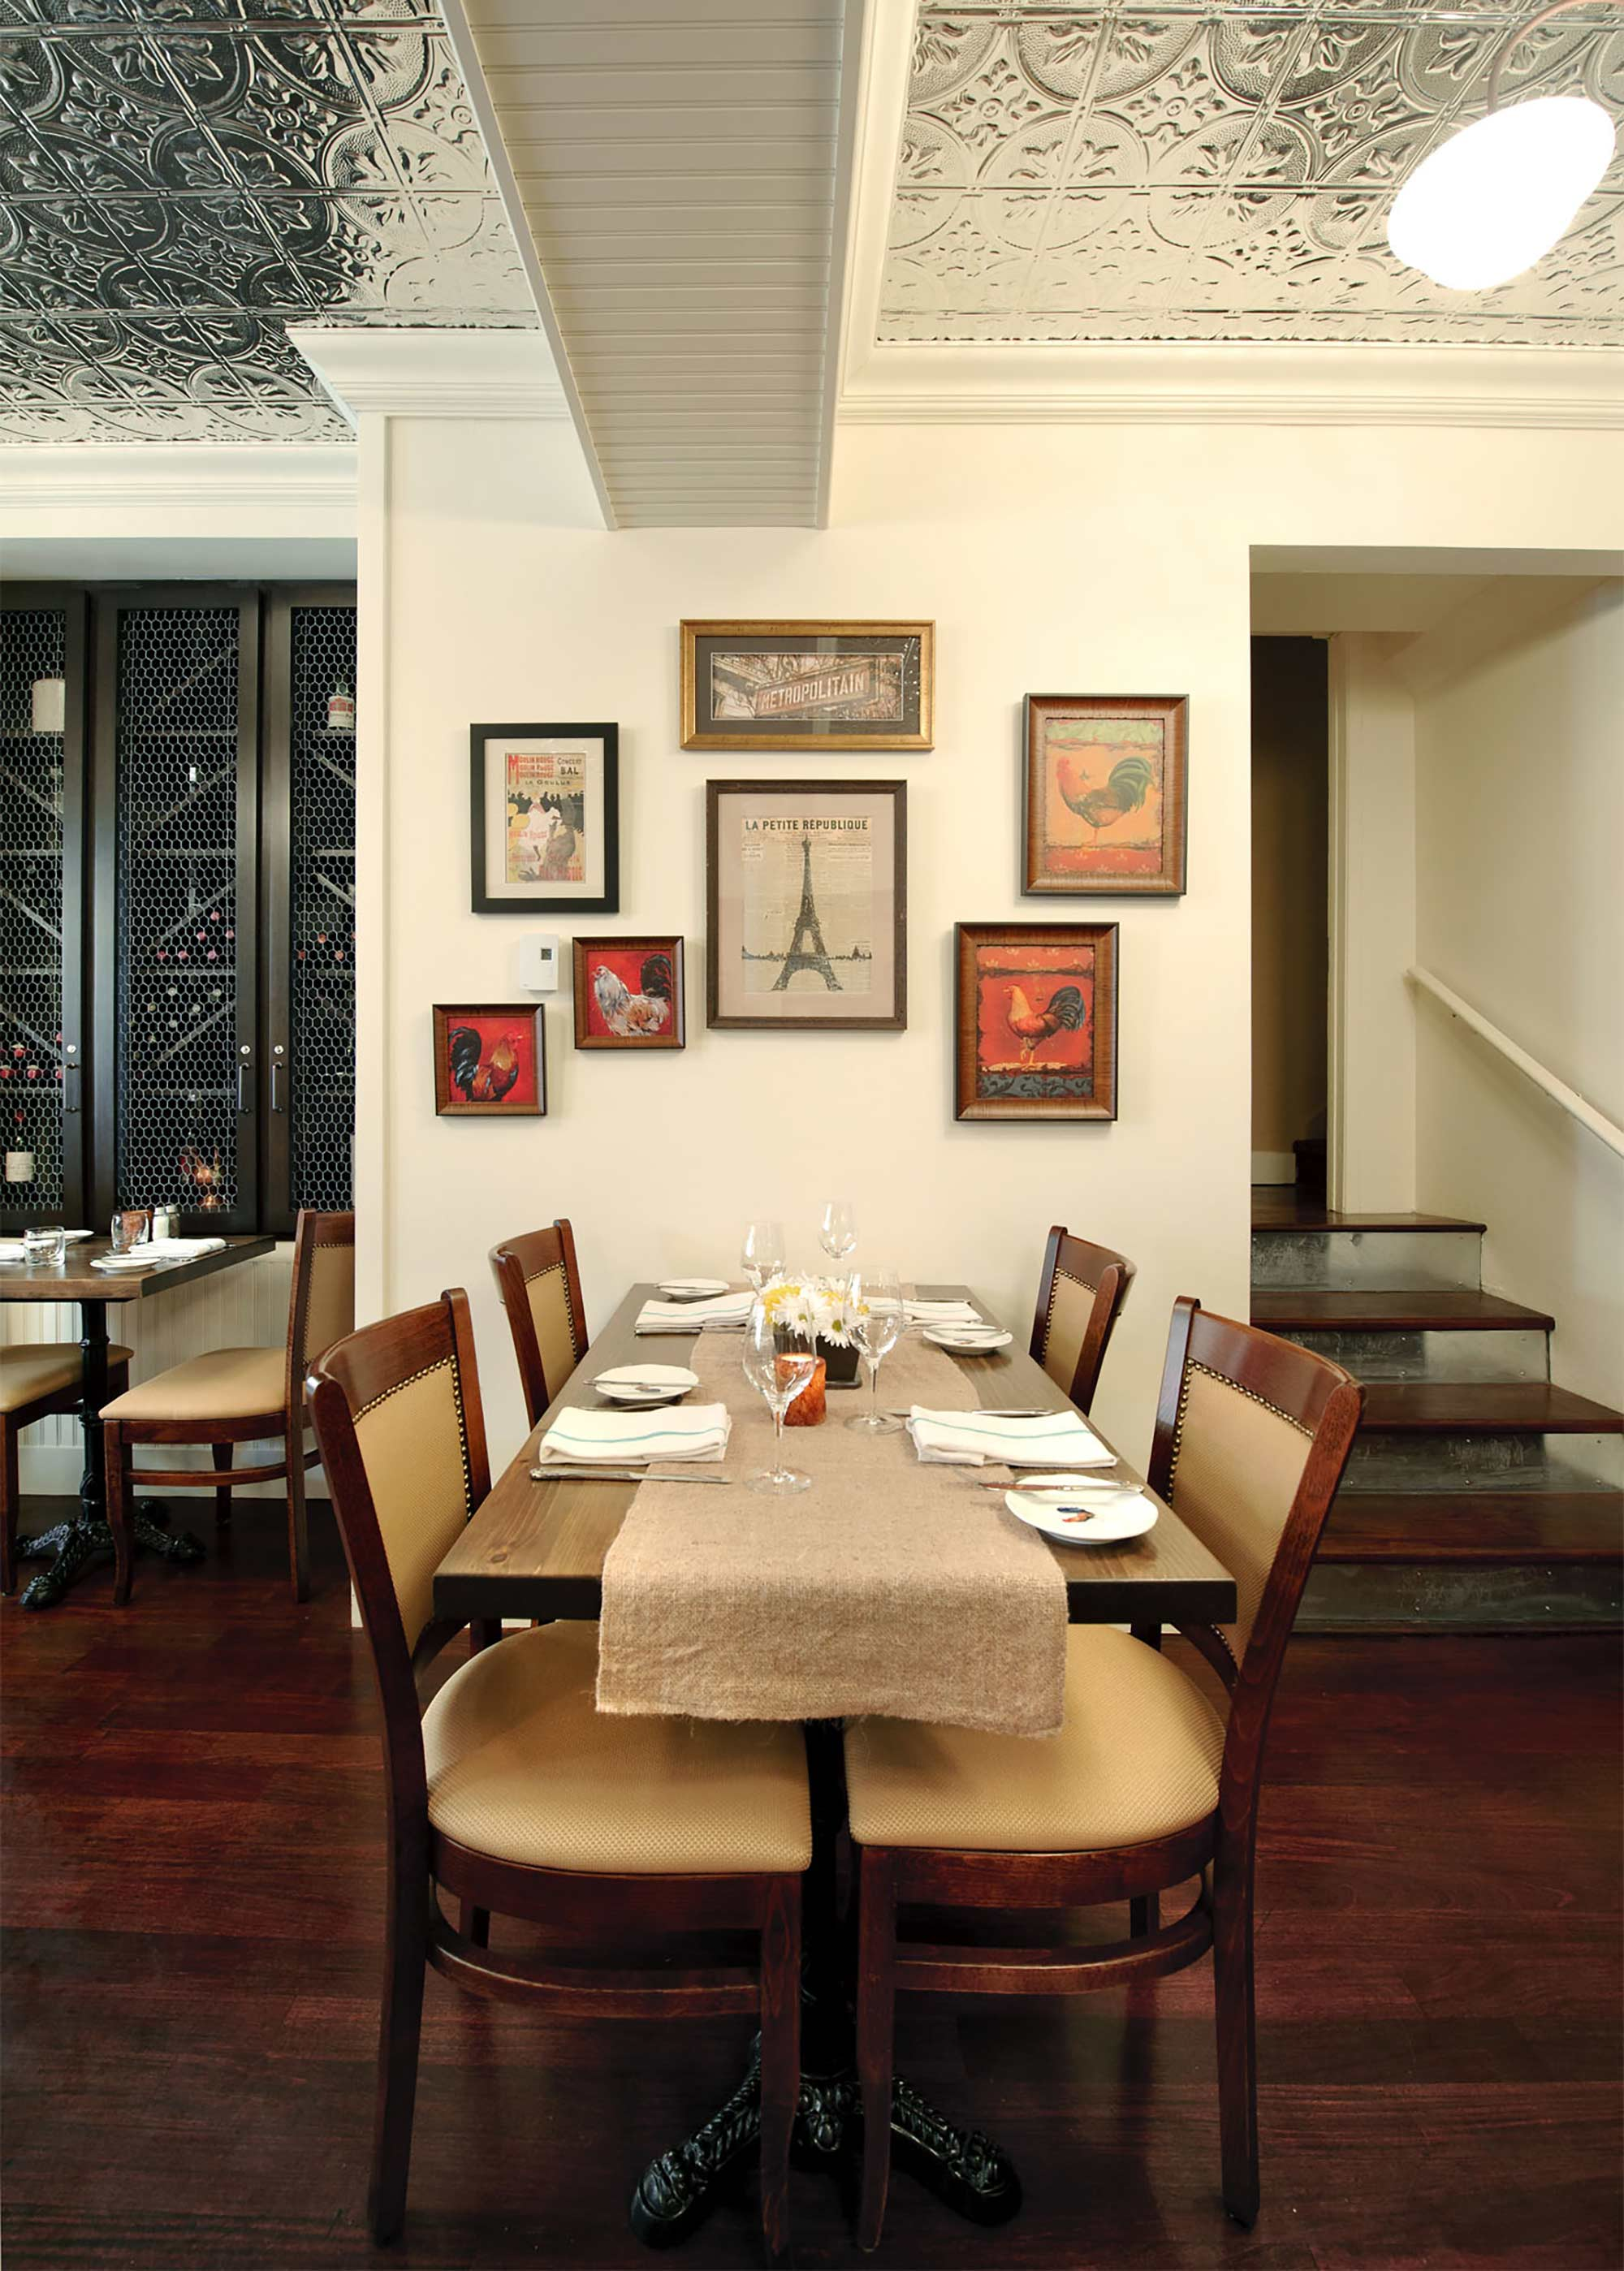 interior-design-french-restaurant-tables.jpg